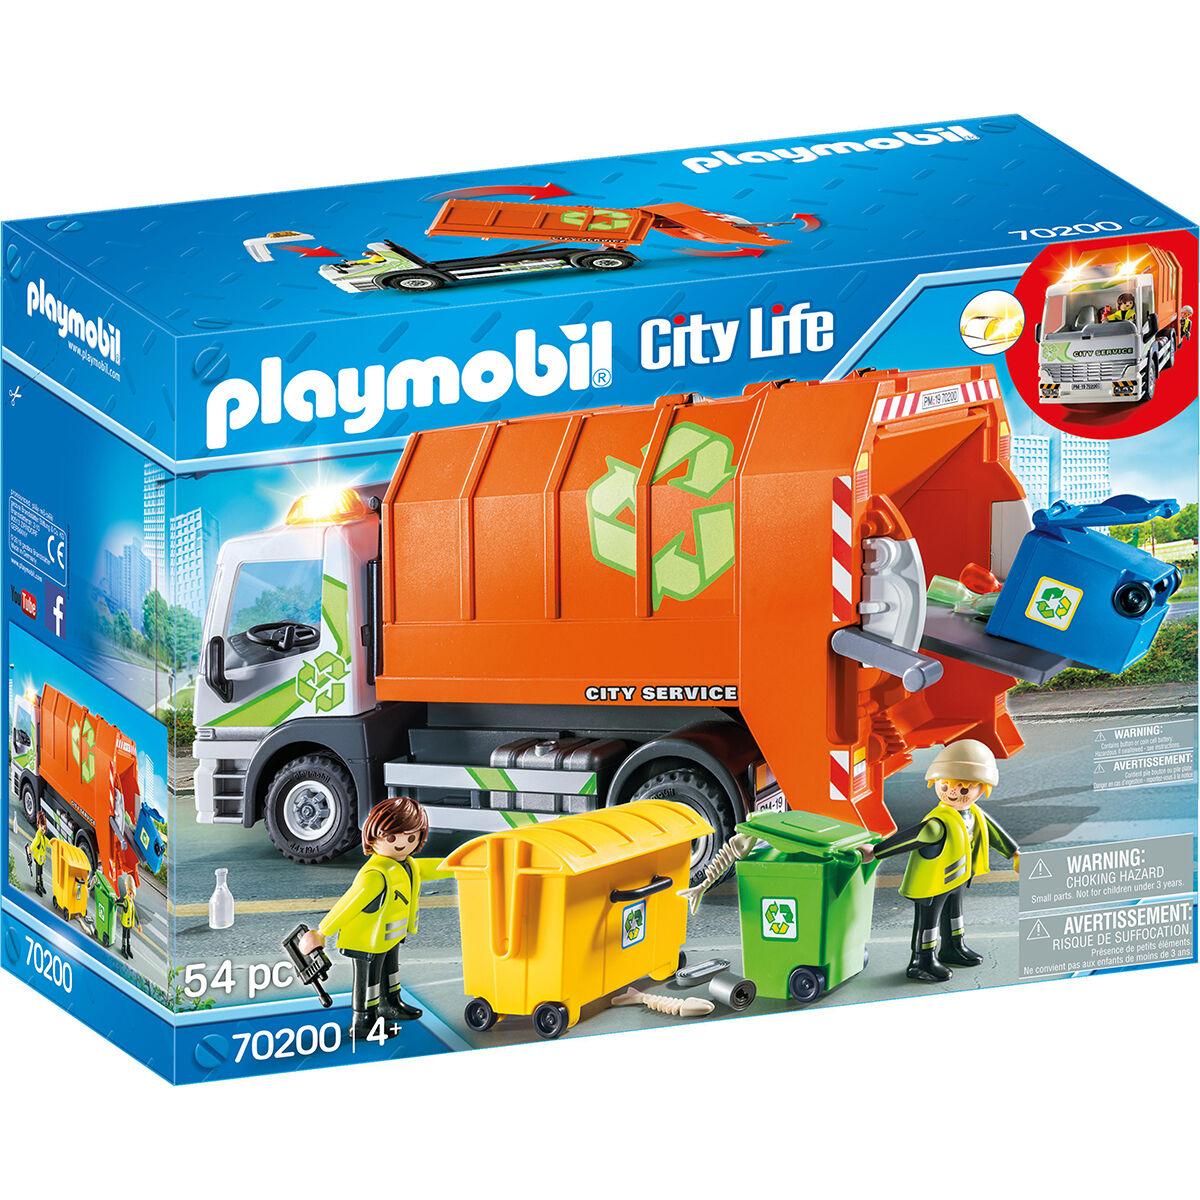 Playmobil City Life - Müllfahrzeug 70200 bei Galeria und Amazon